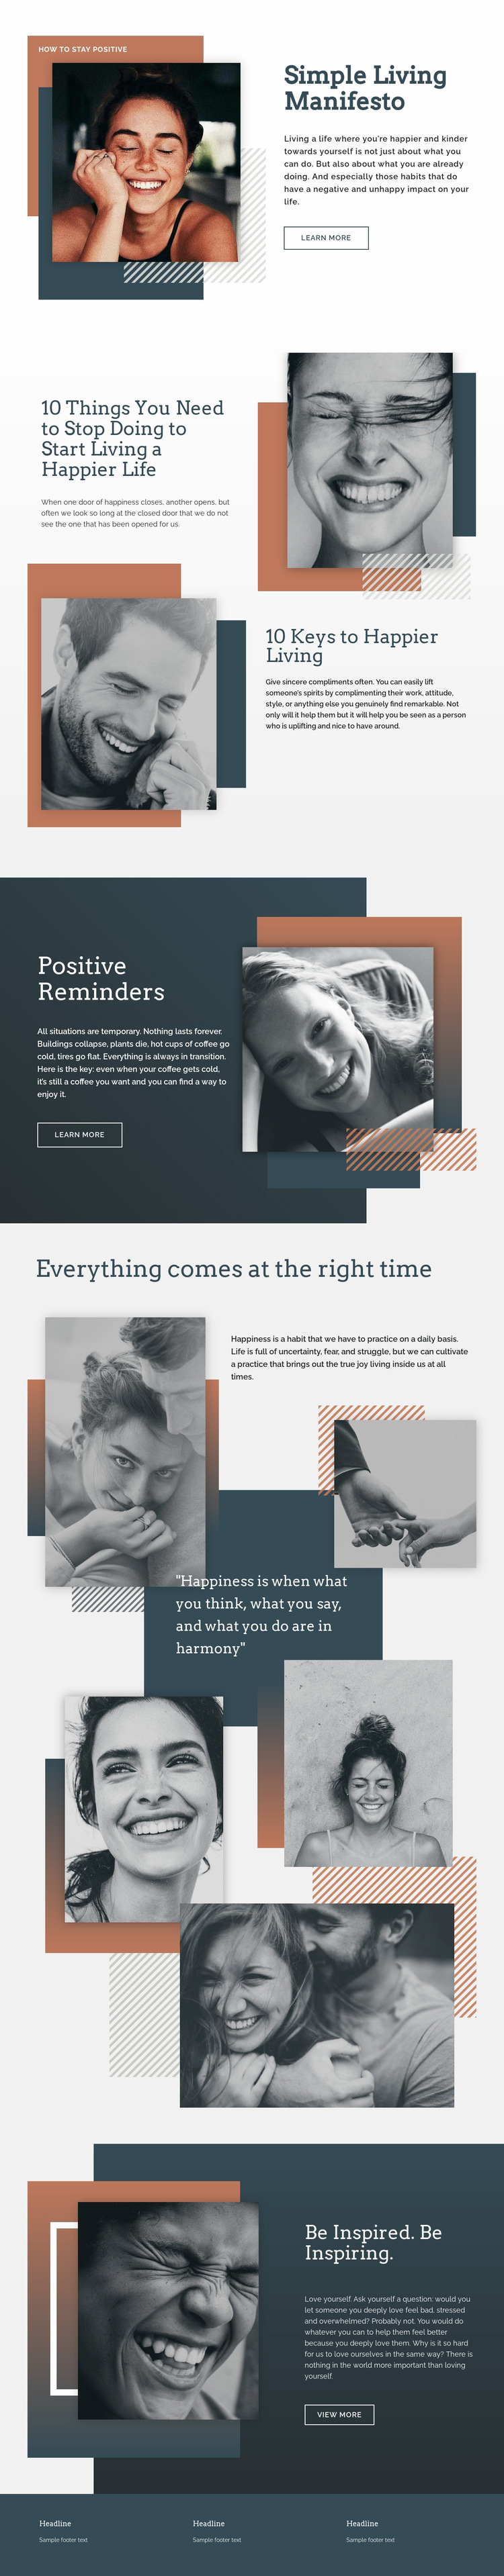 Simple Living Light Web Page Design